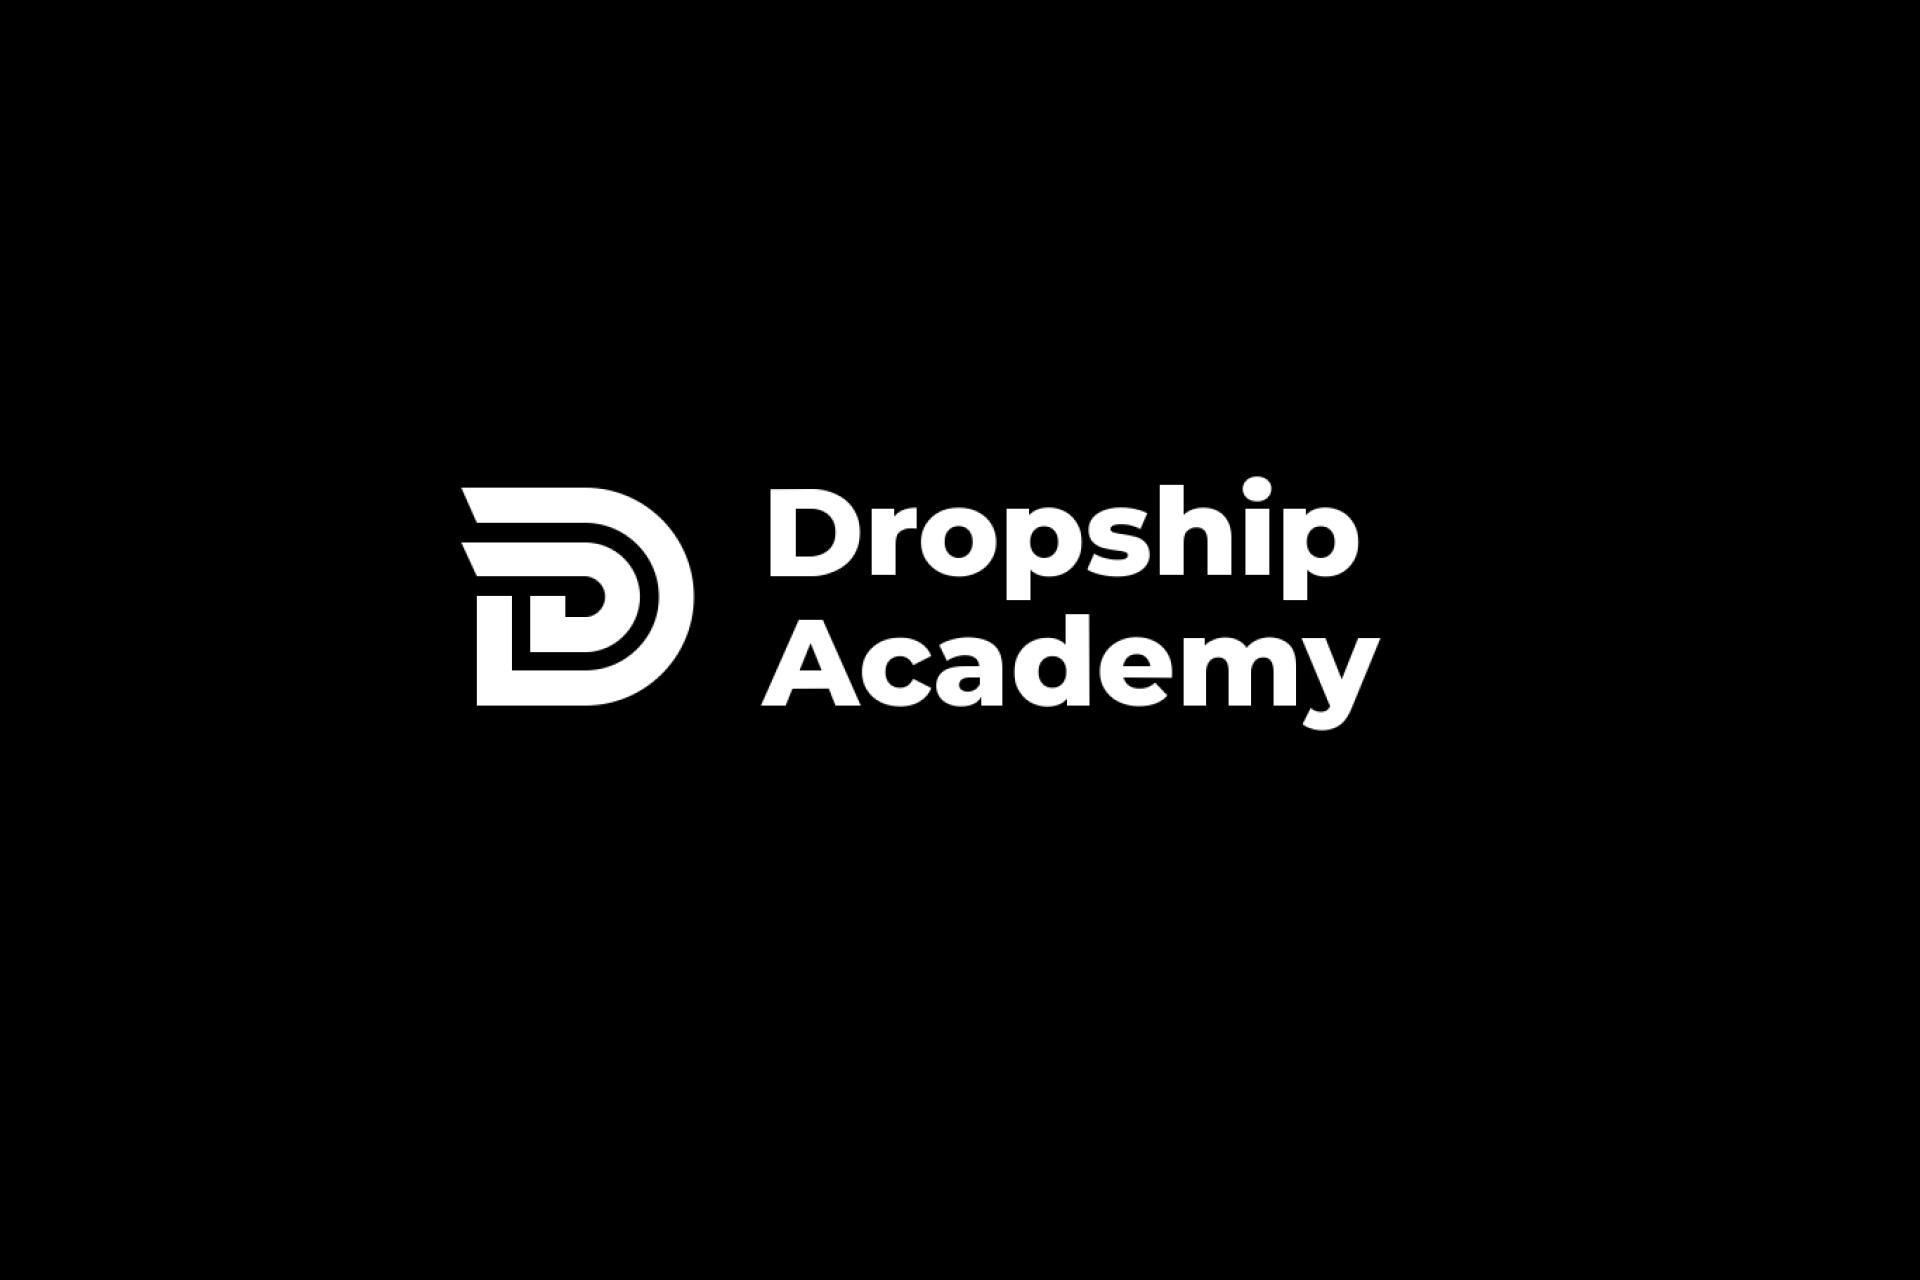 Dropship Academy Kortingscode